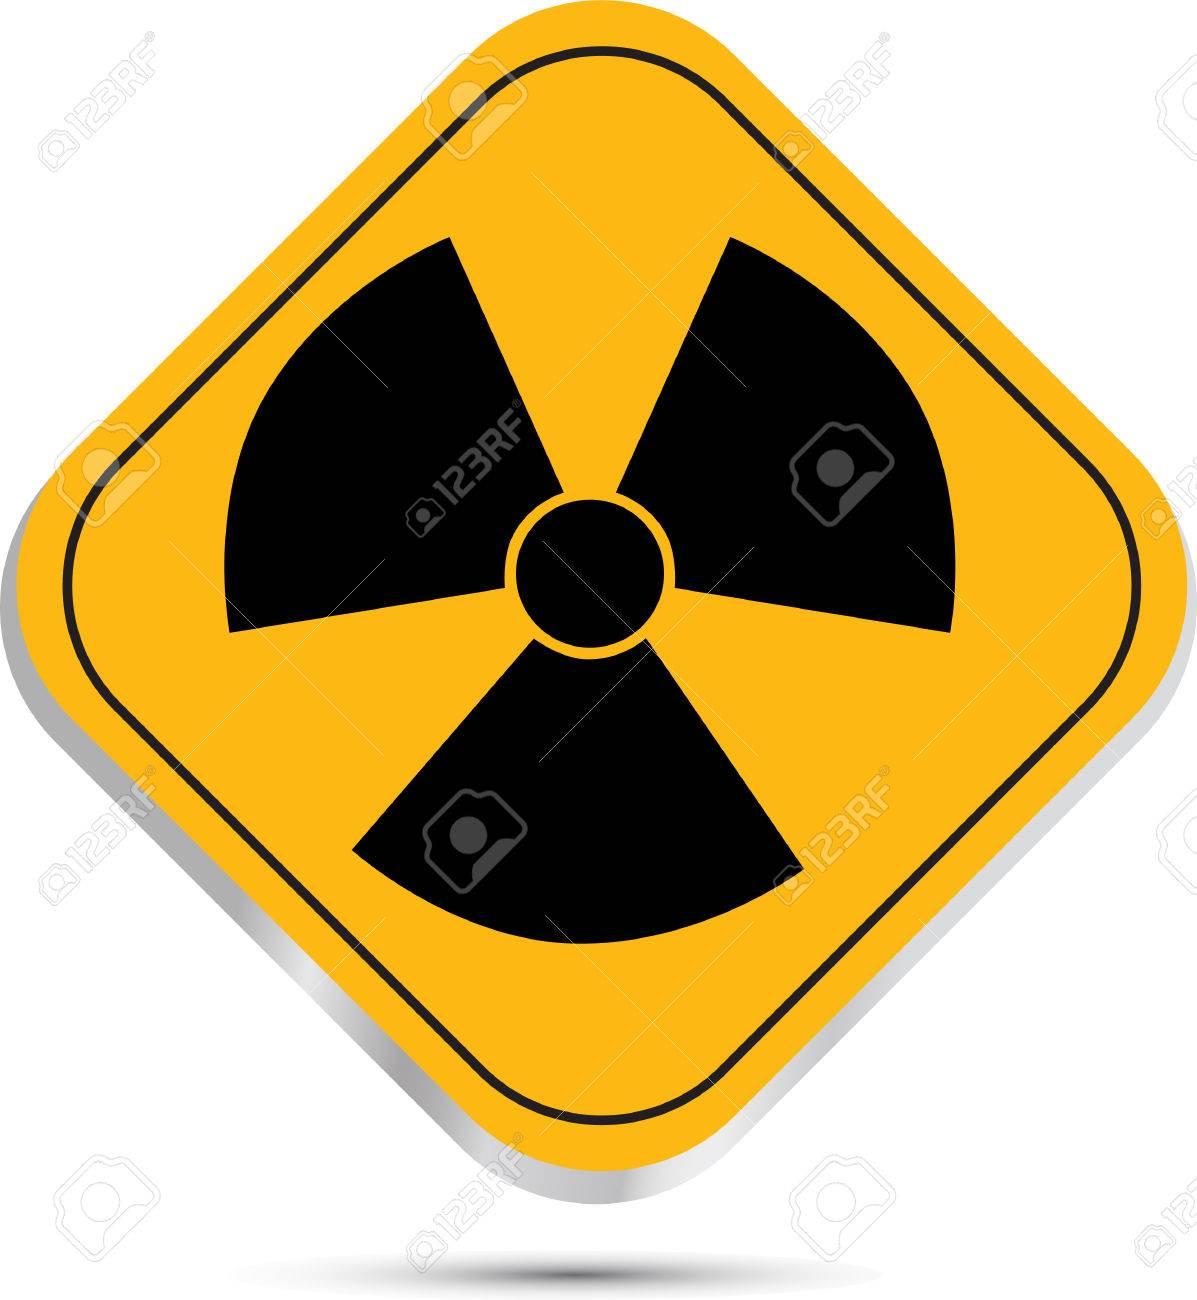 Radiation hazard symbol sign Stock Vector - 27865387